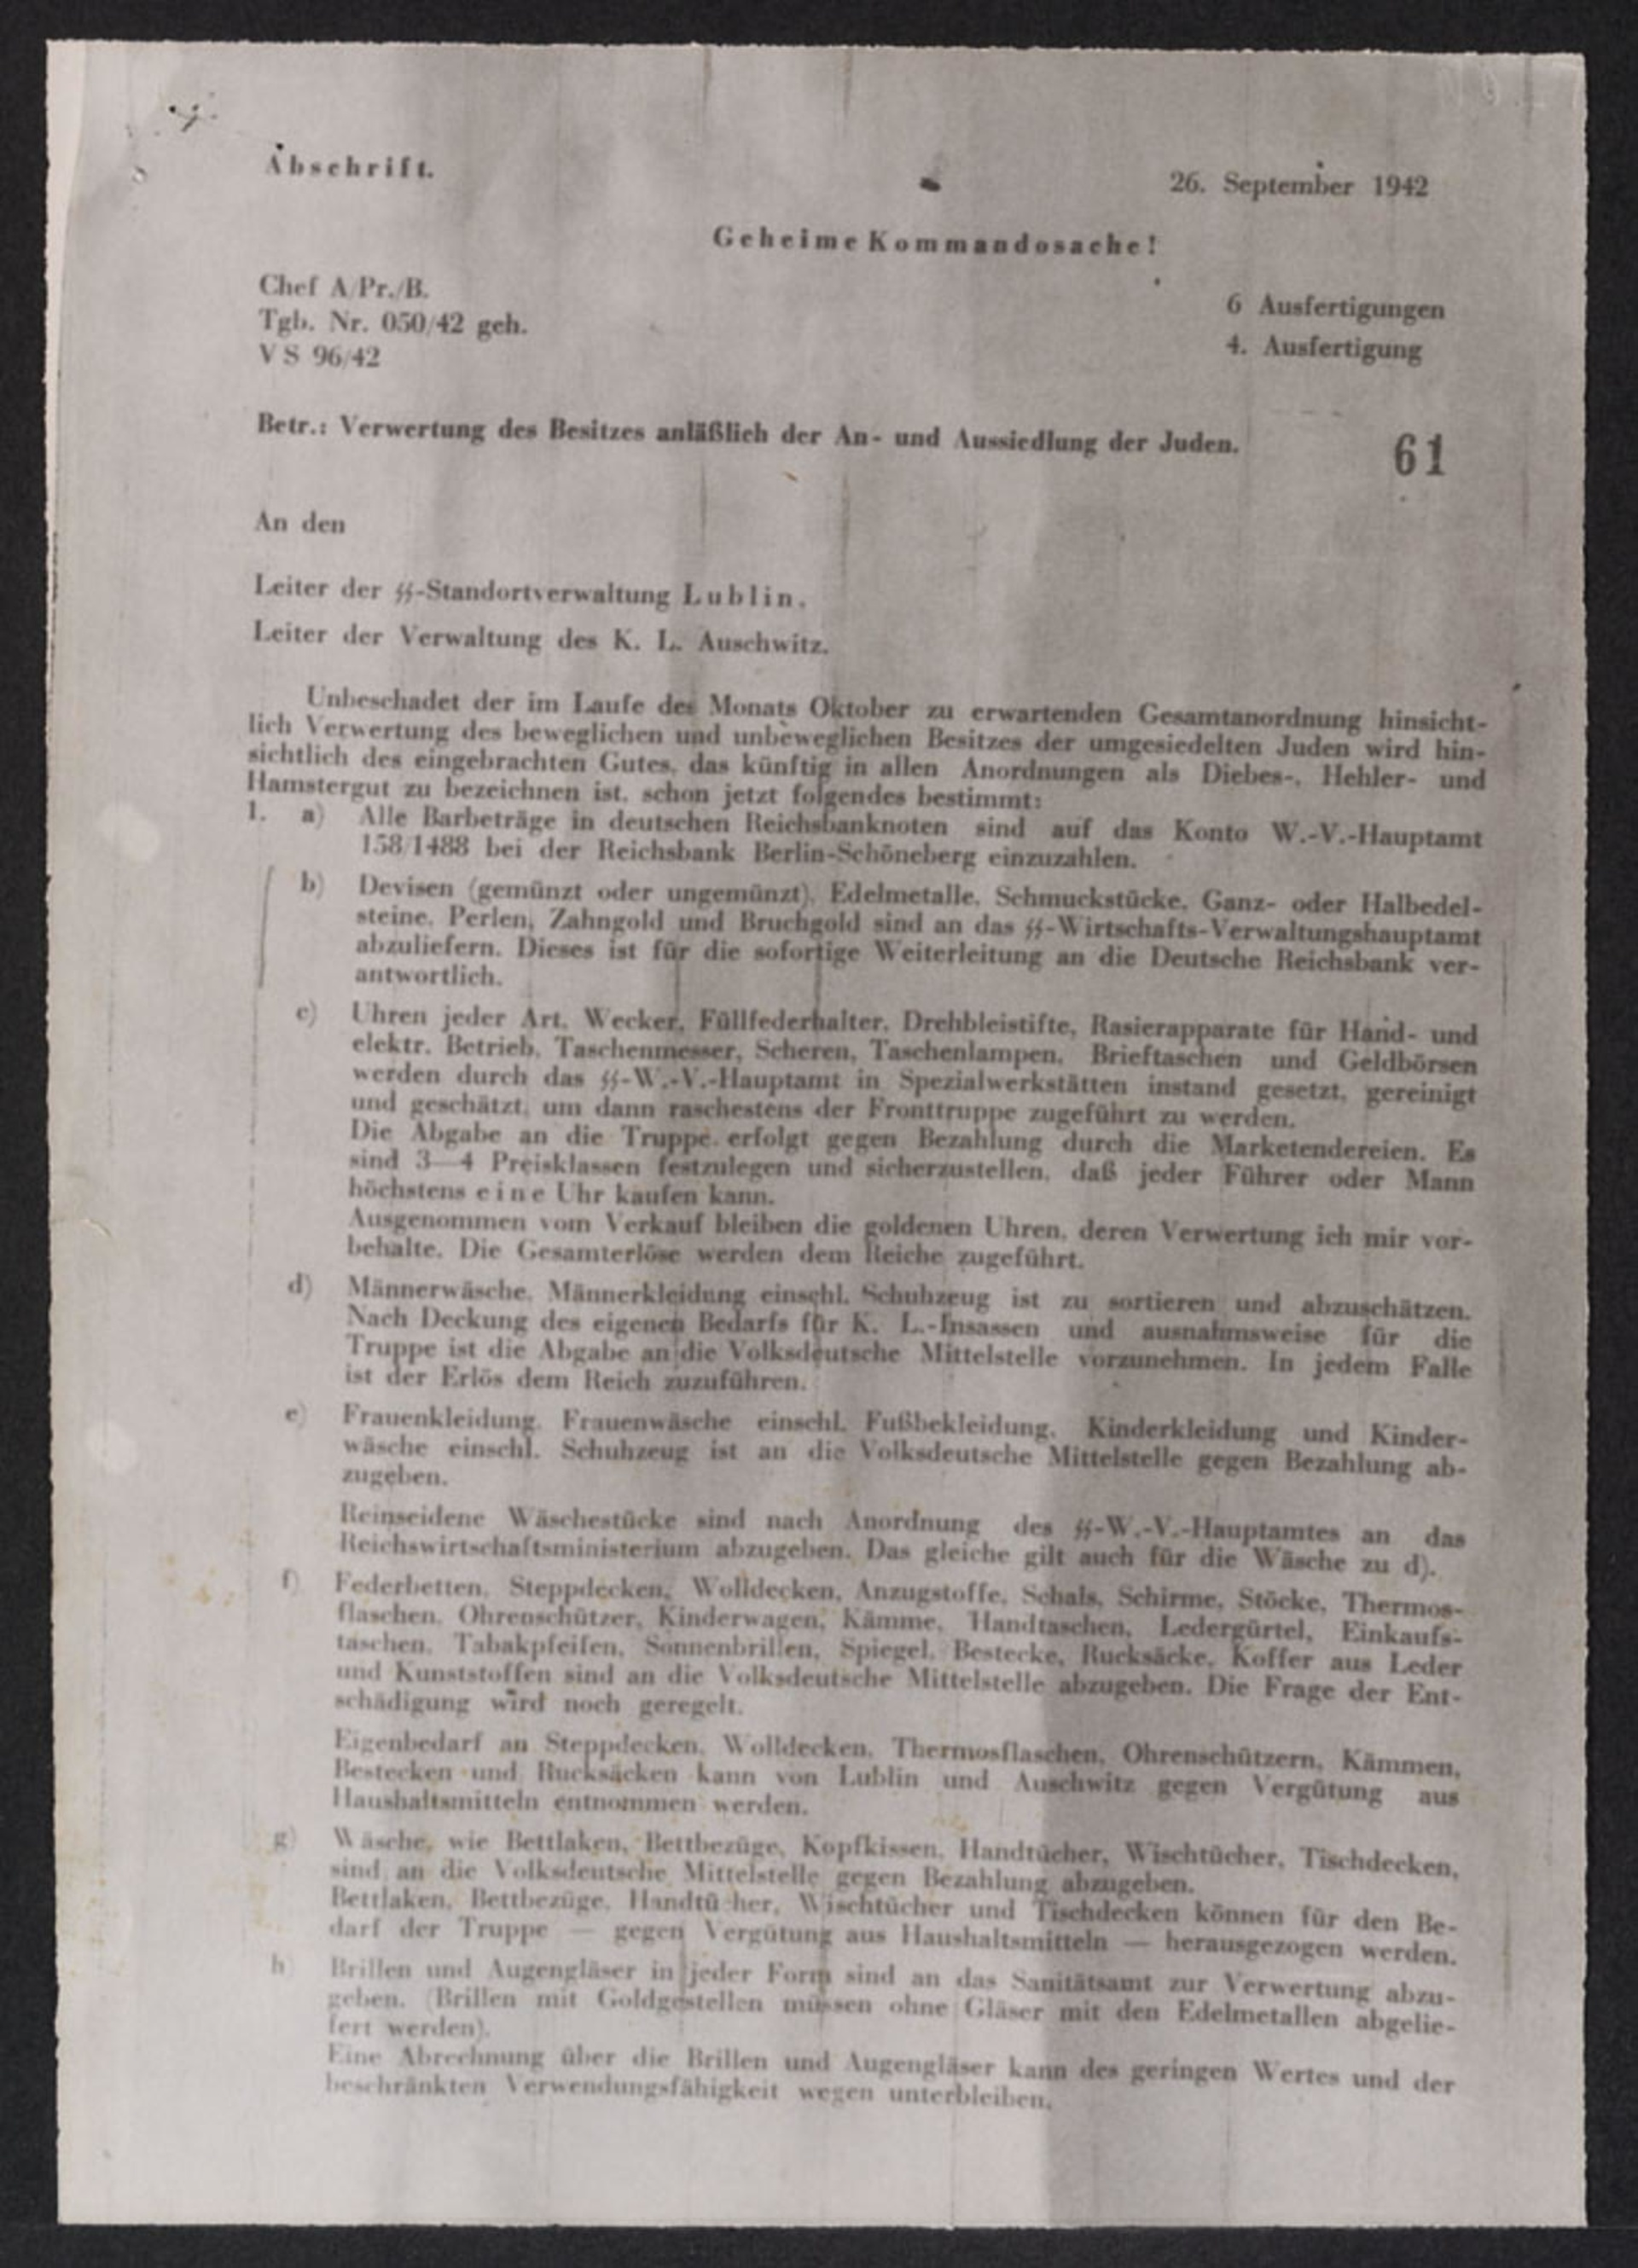 august frank memorandum